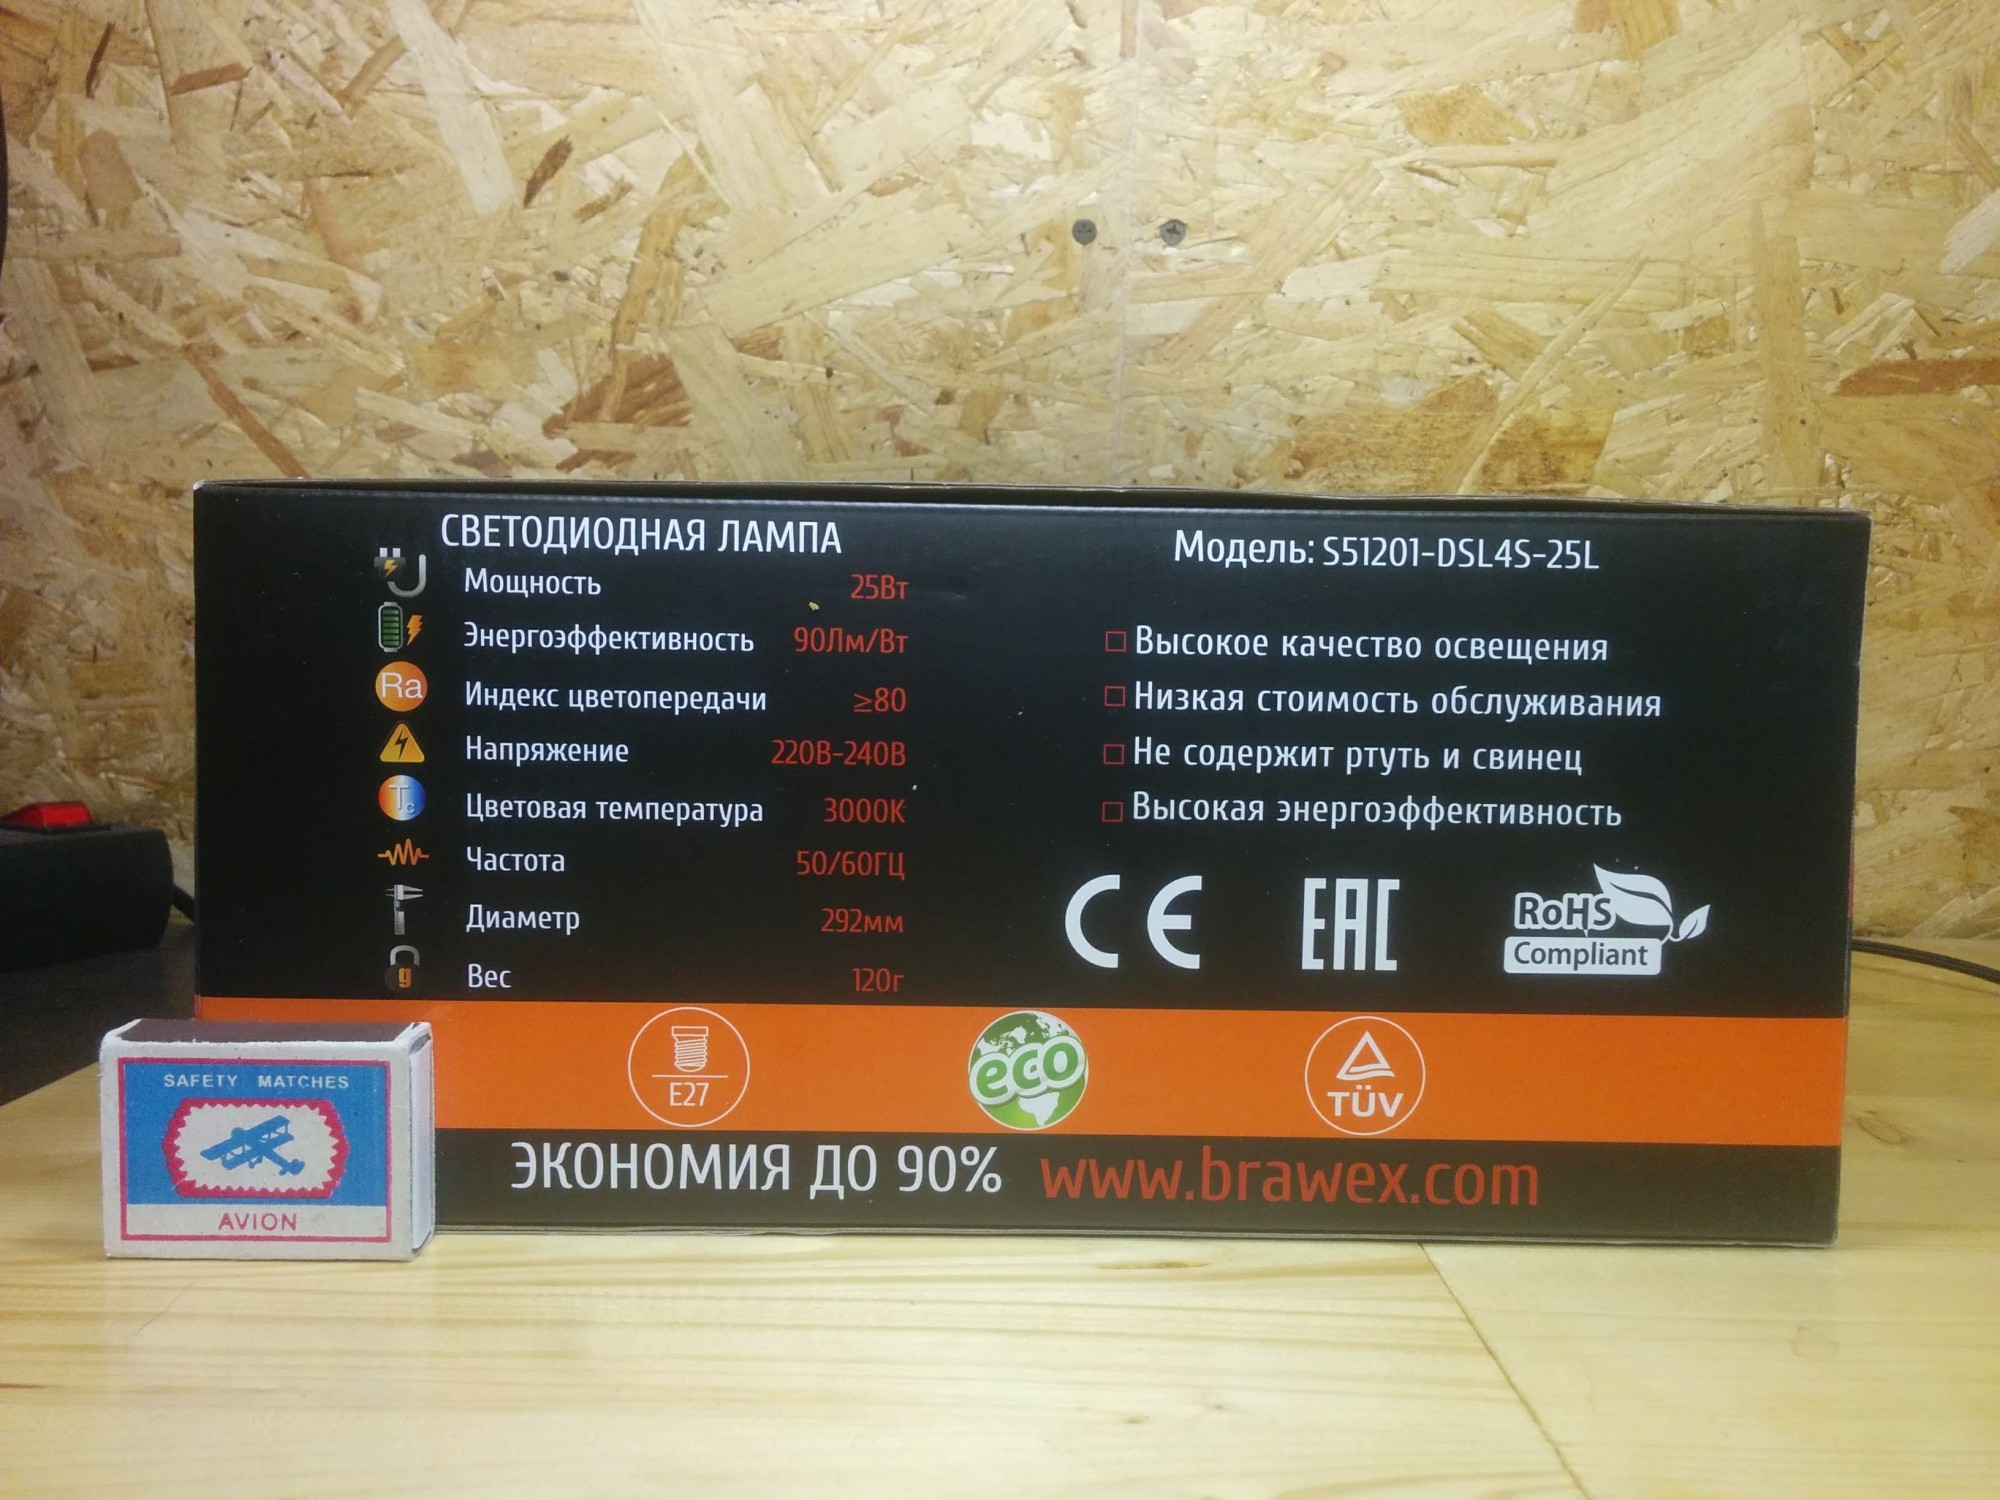 Brawex S51201-DSL4S-25L арт. S51201-DSL4S-25L Характеристики